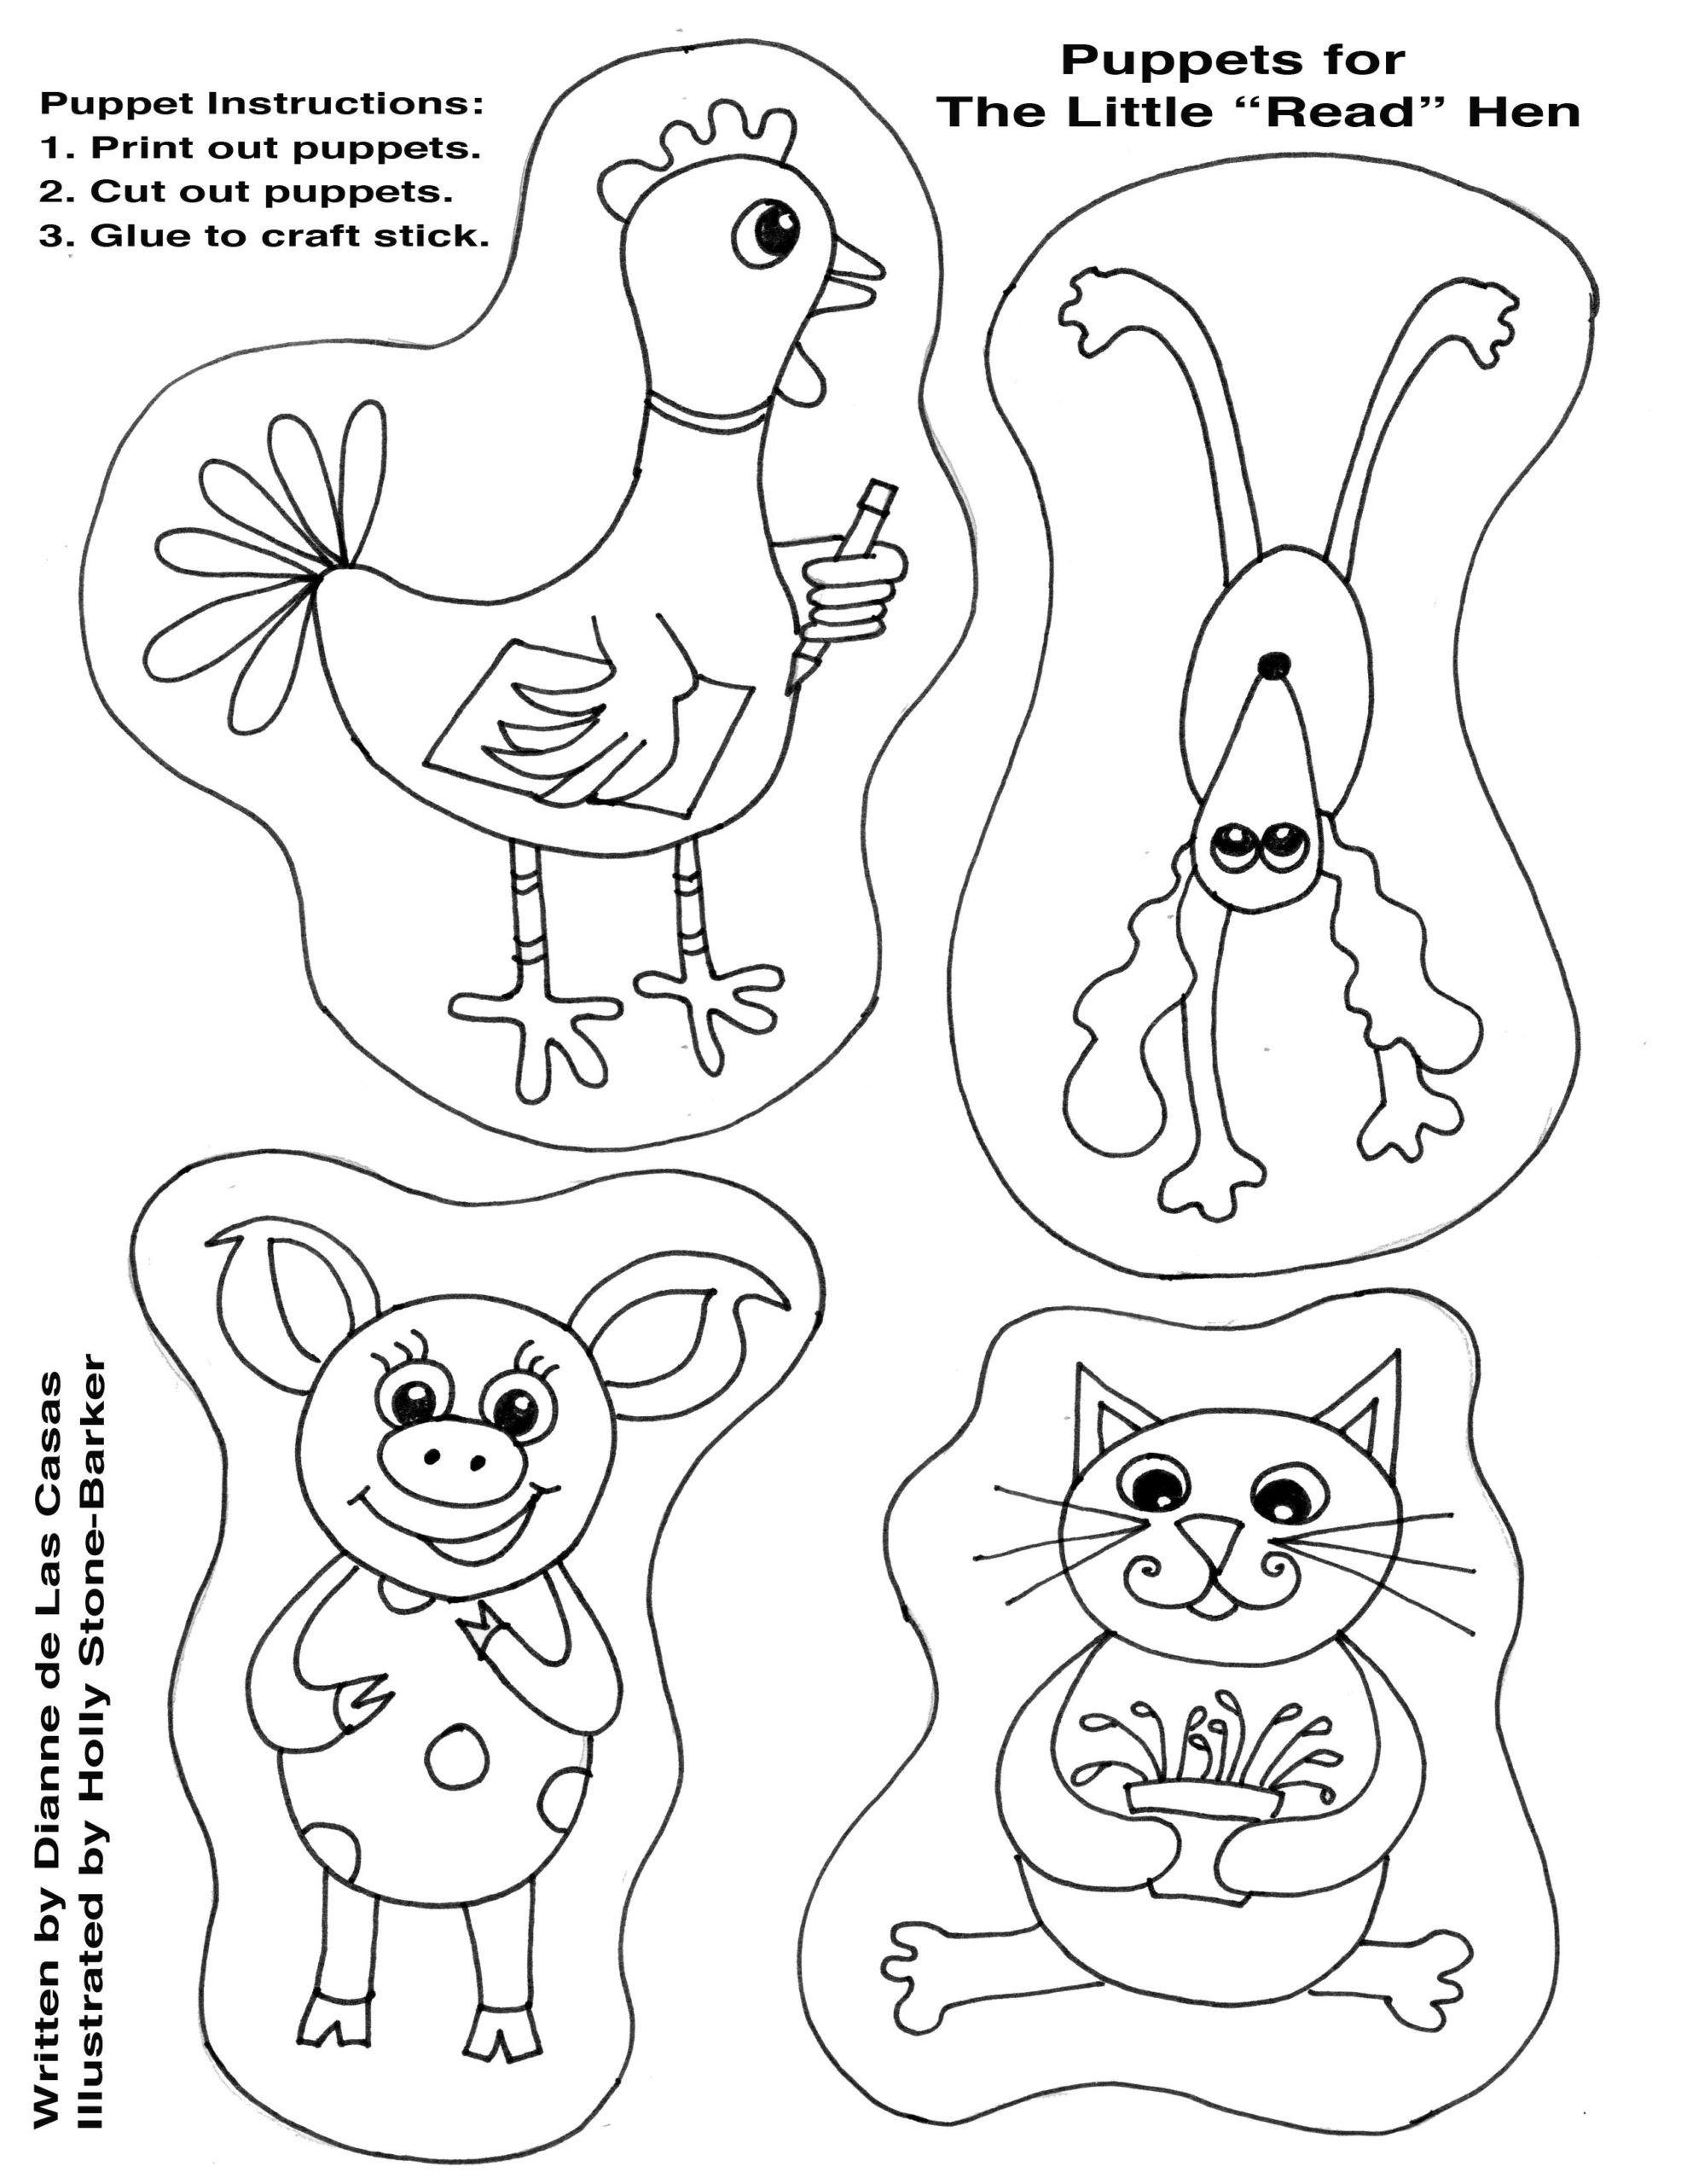 Fairy Tale Worksheets For Kindergarten Worksheet For Kindergarten Kindergarten Worksheets Fairy Tales Kindergarten Kindergarten Worksheets Printable